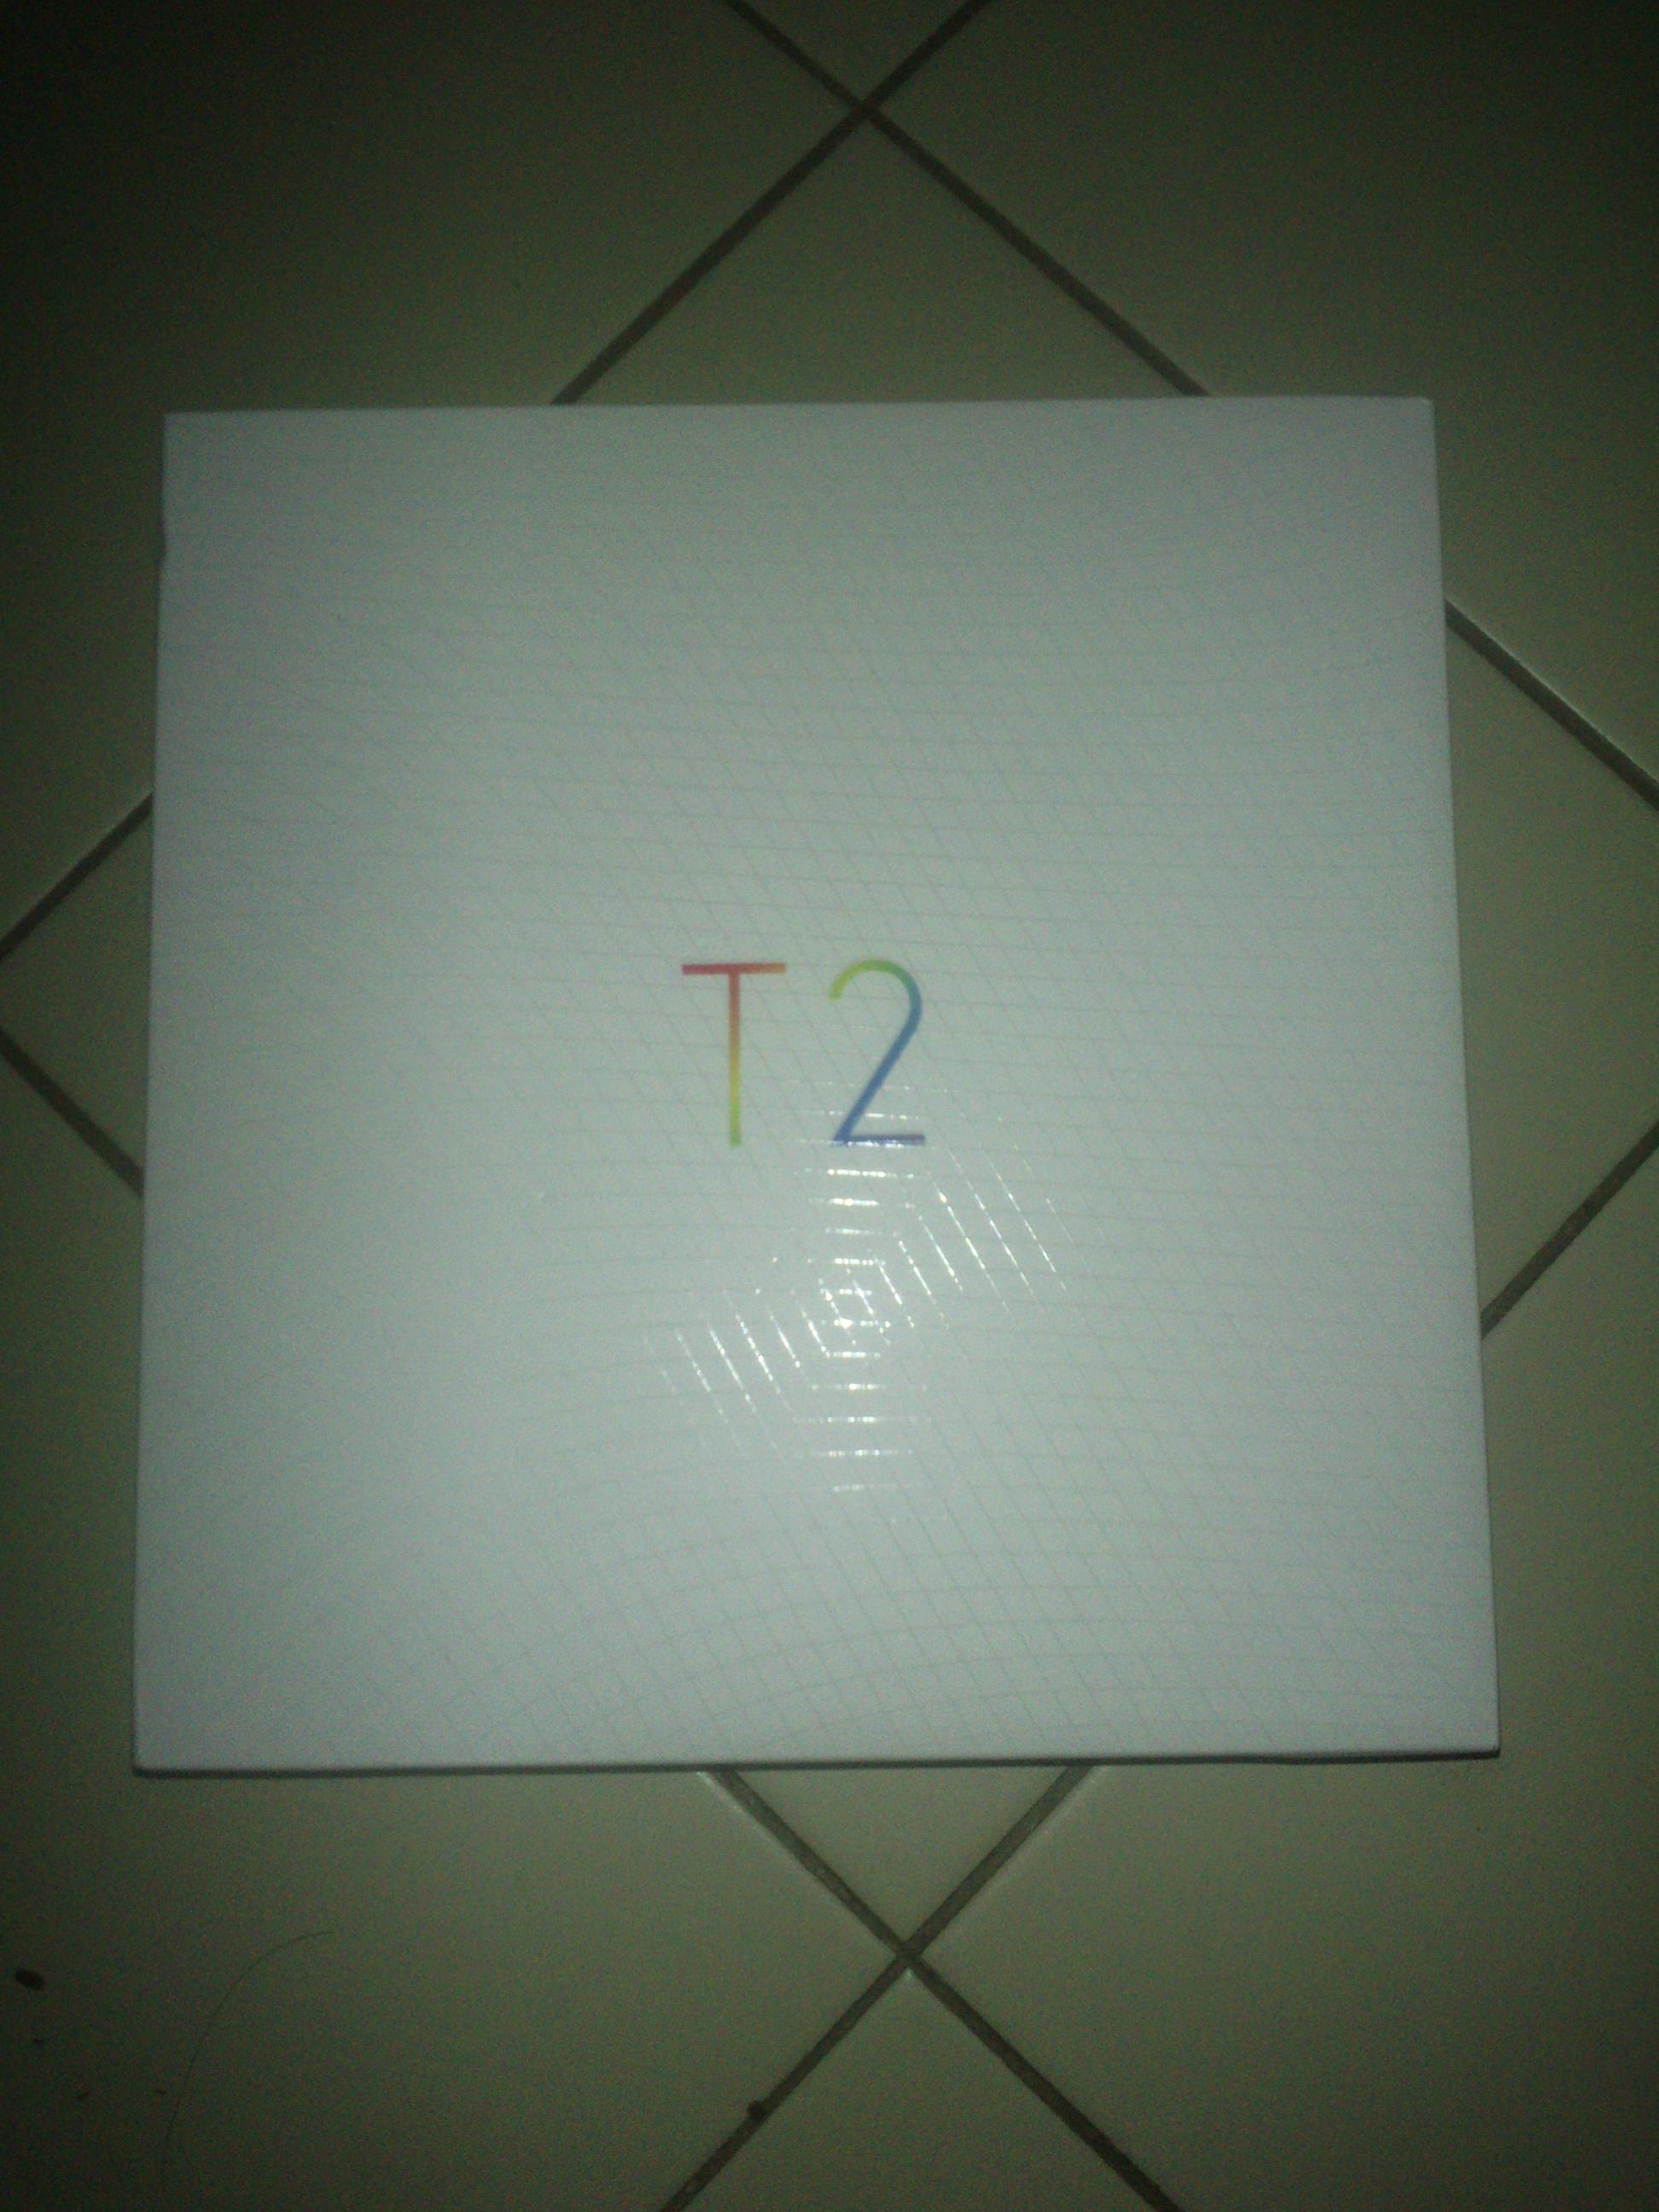 Review : รีวิว TTPOD T2 กับการฟังเพลงแนว J-POP สไตล์ลูกทุ่งๆ